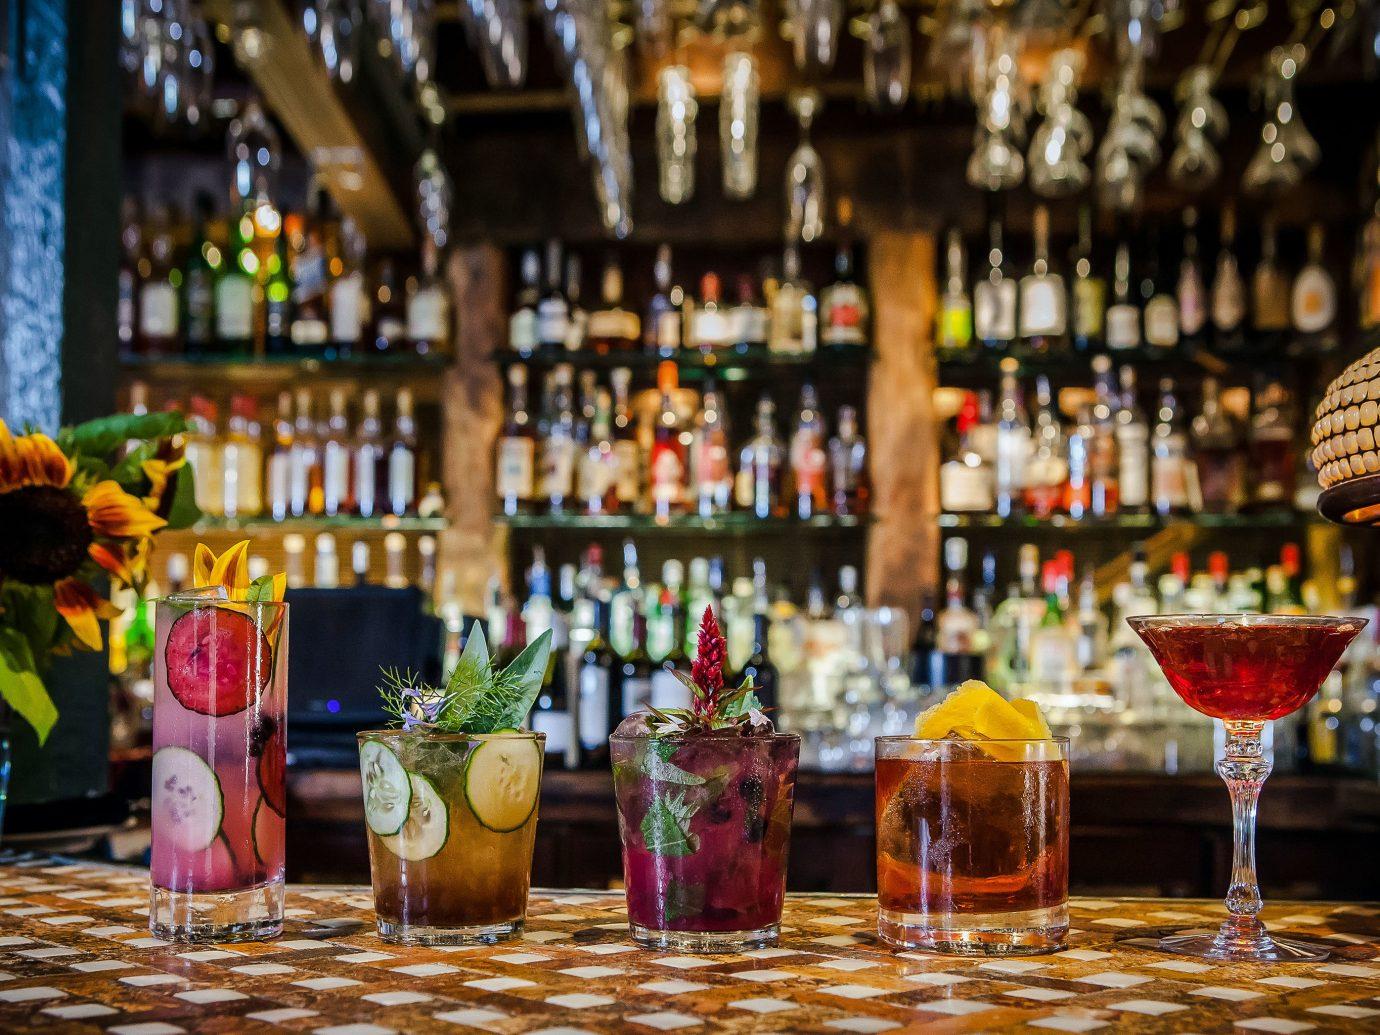 Hotels Romance Spa Retreats Trip Ideas indoor distilled beverage Drink alcoholic beverage liqueur Bar alcohol floristry tavern